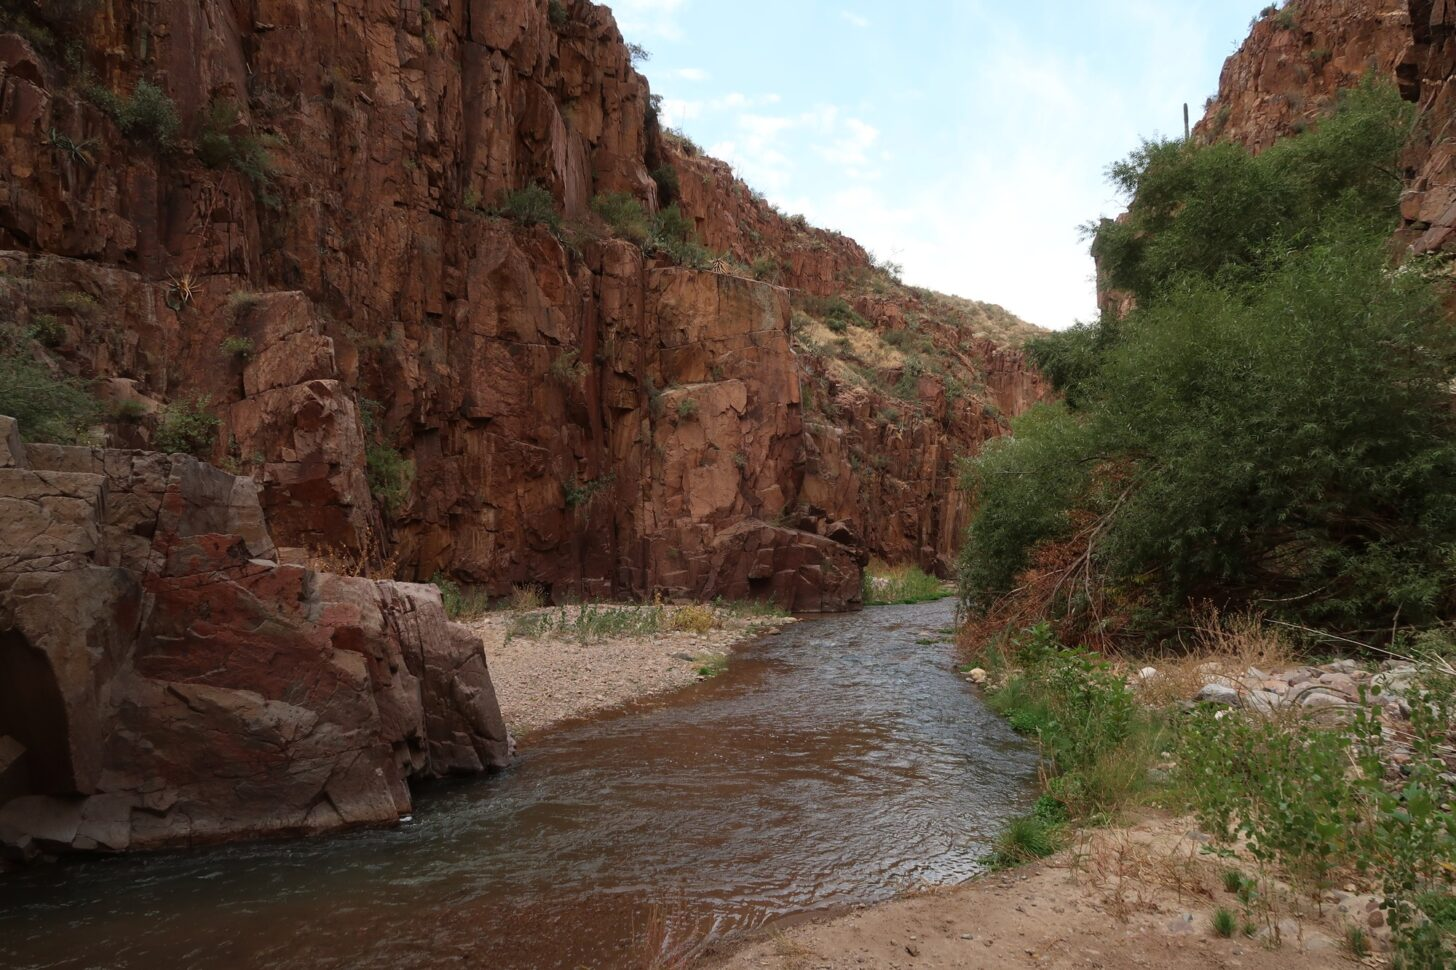 a stream flows through a low desert canyon.